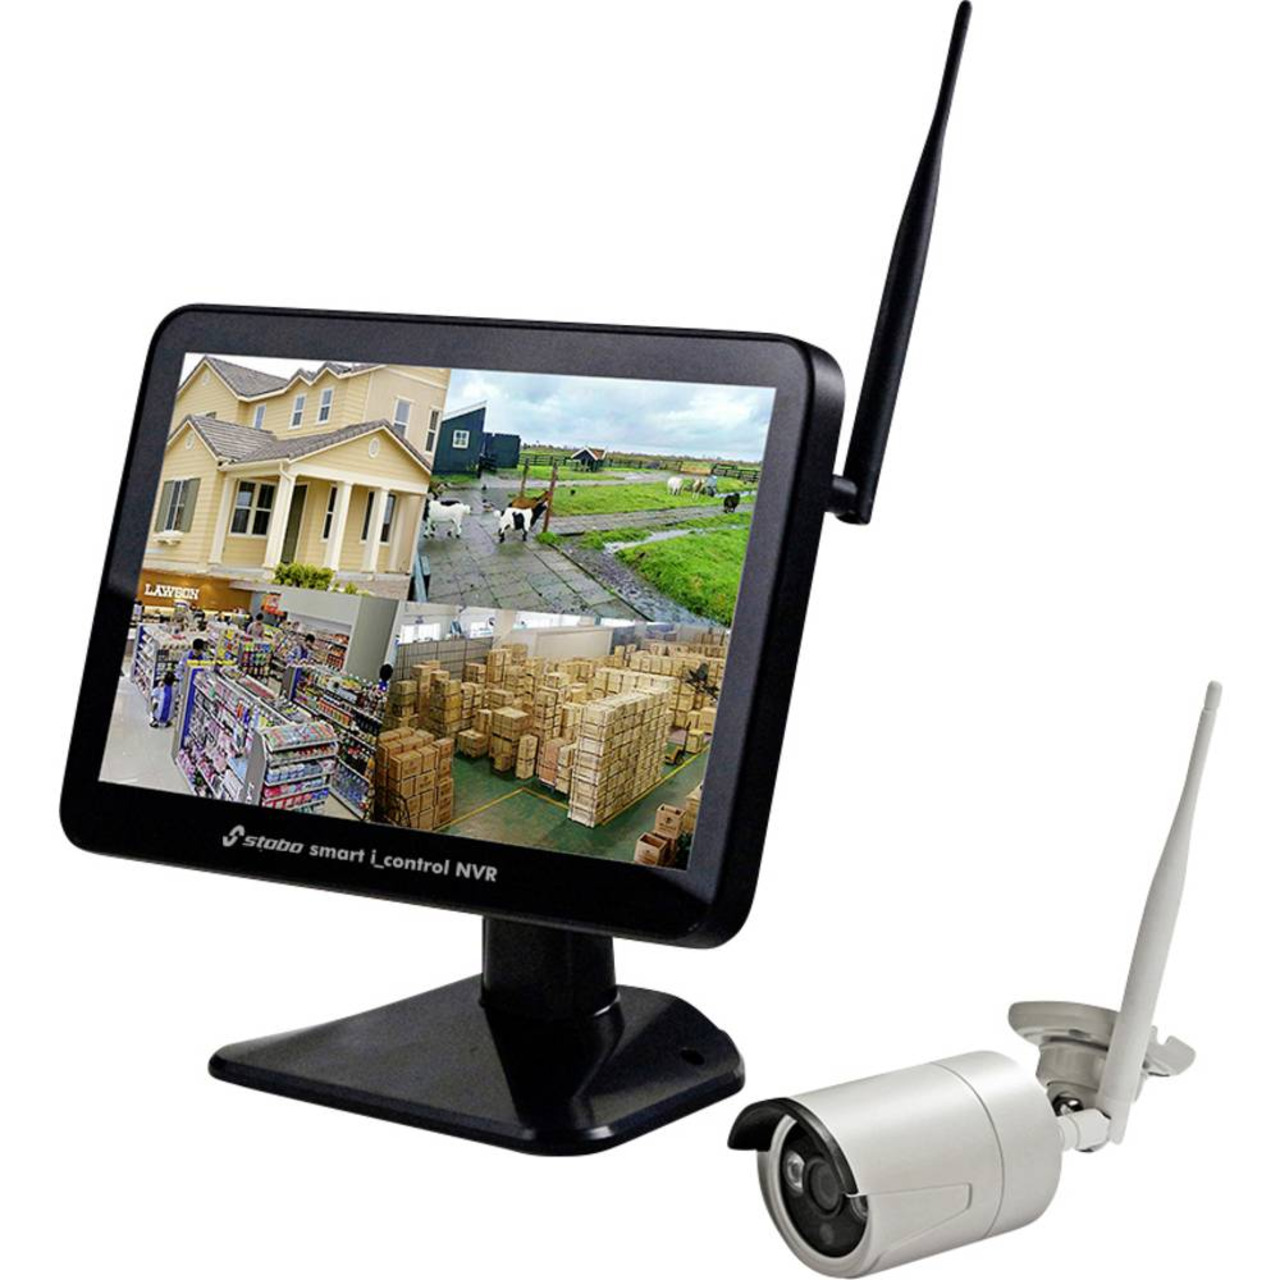 stabo Funk-Kamerasystem smart i-control NVR- 2-4 GHz- App (iOS und Android)- Full-HD (1080p)